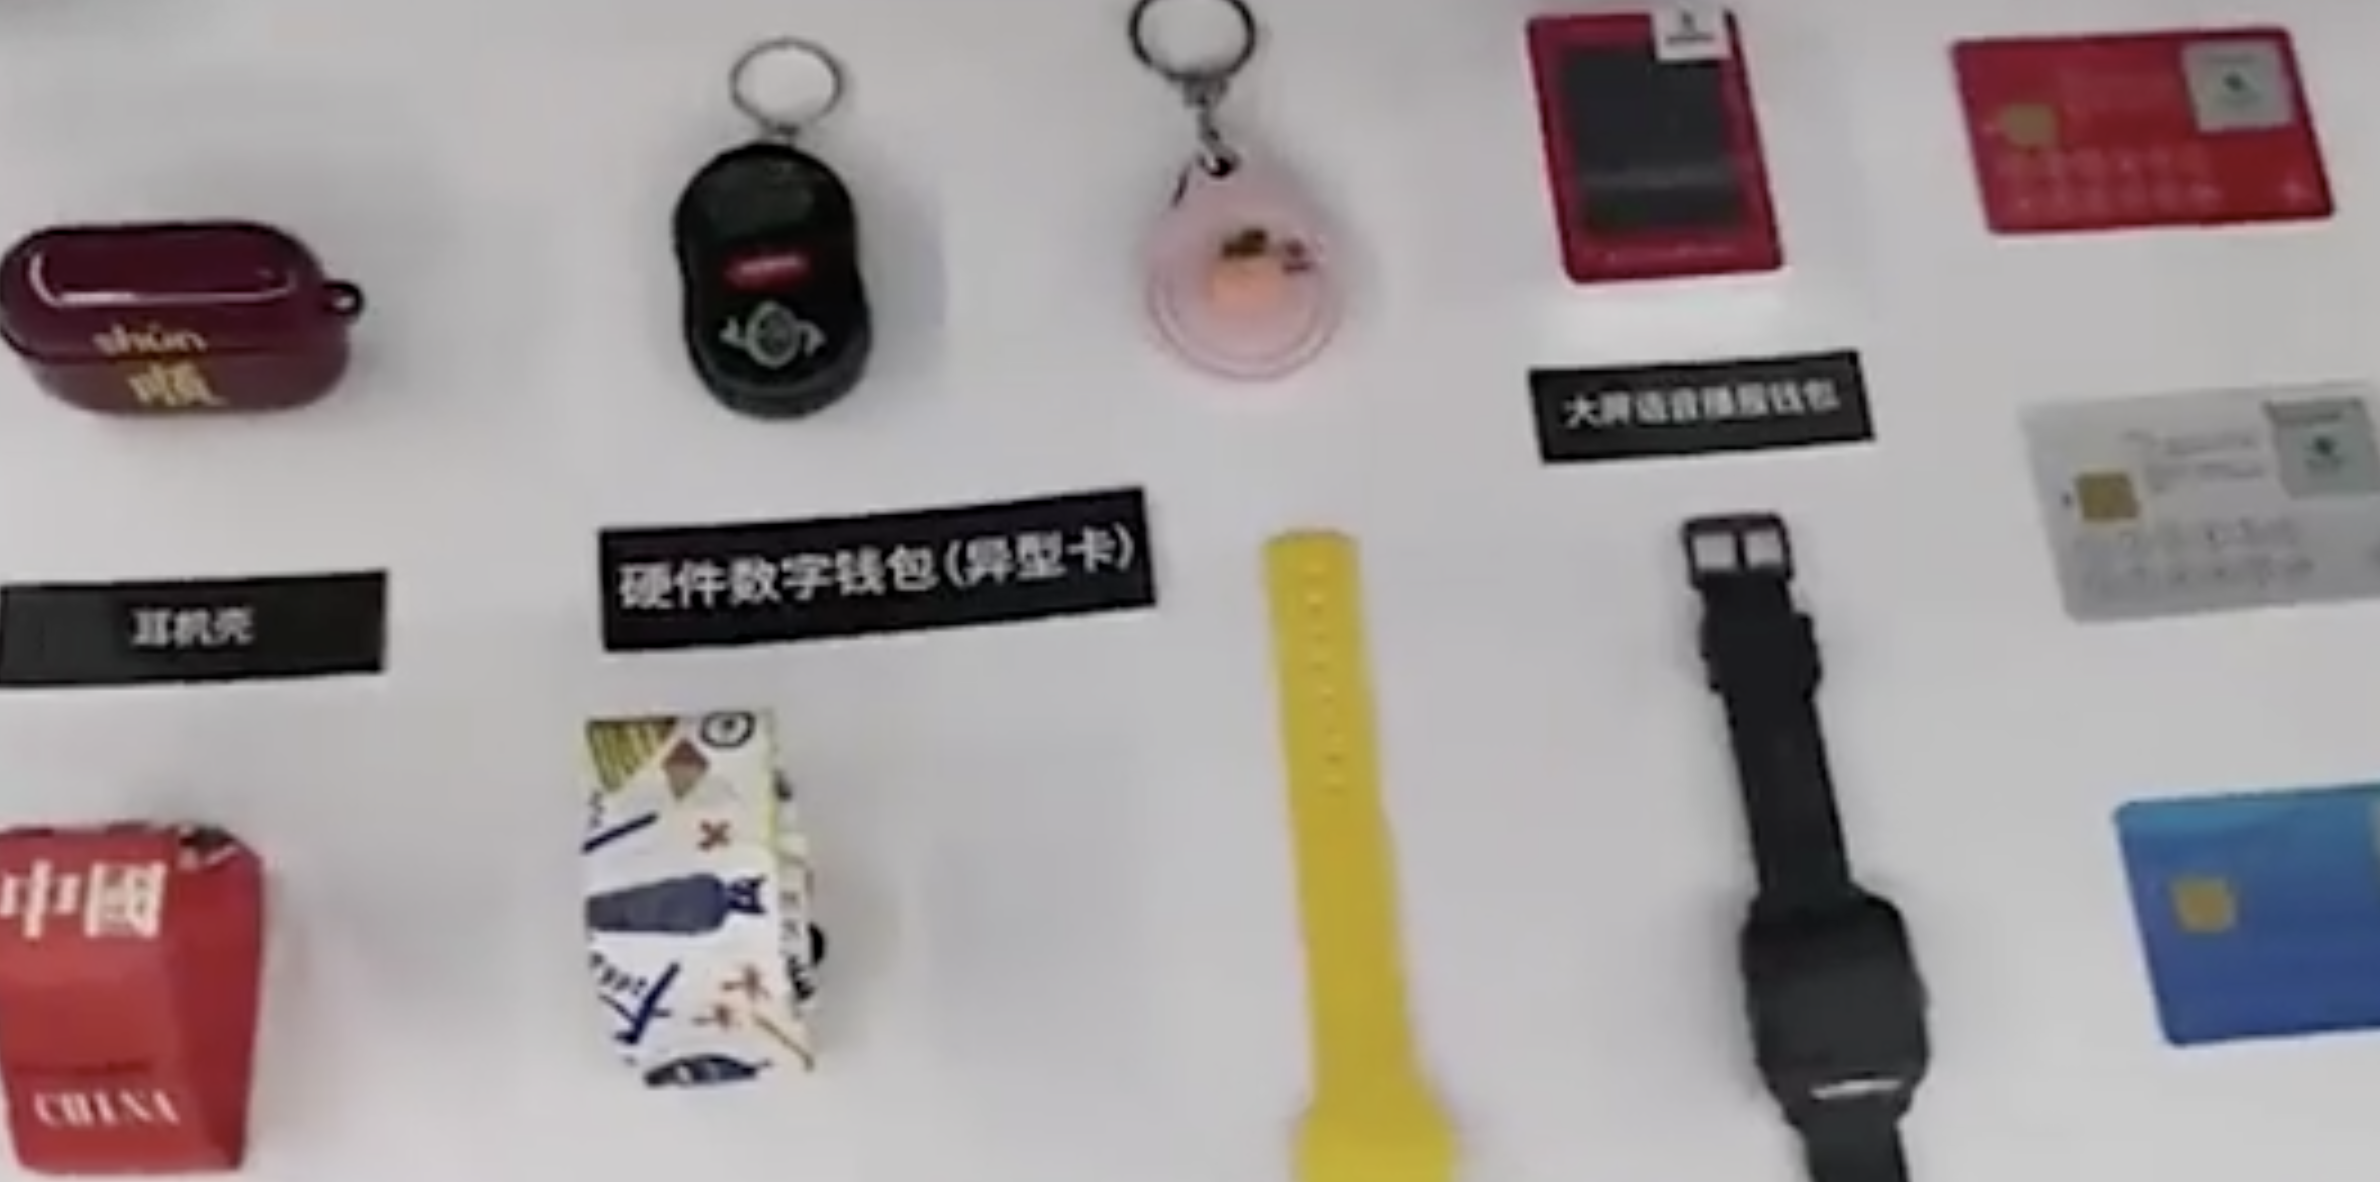 c-CNY hardware wallets, July 2021